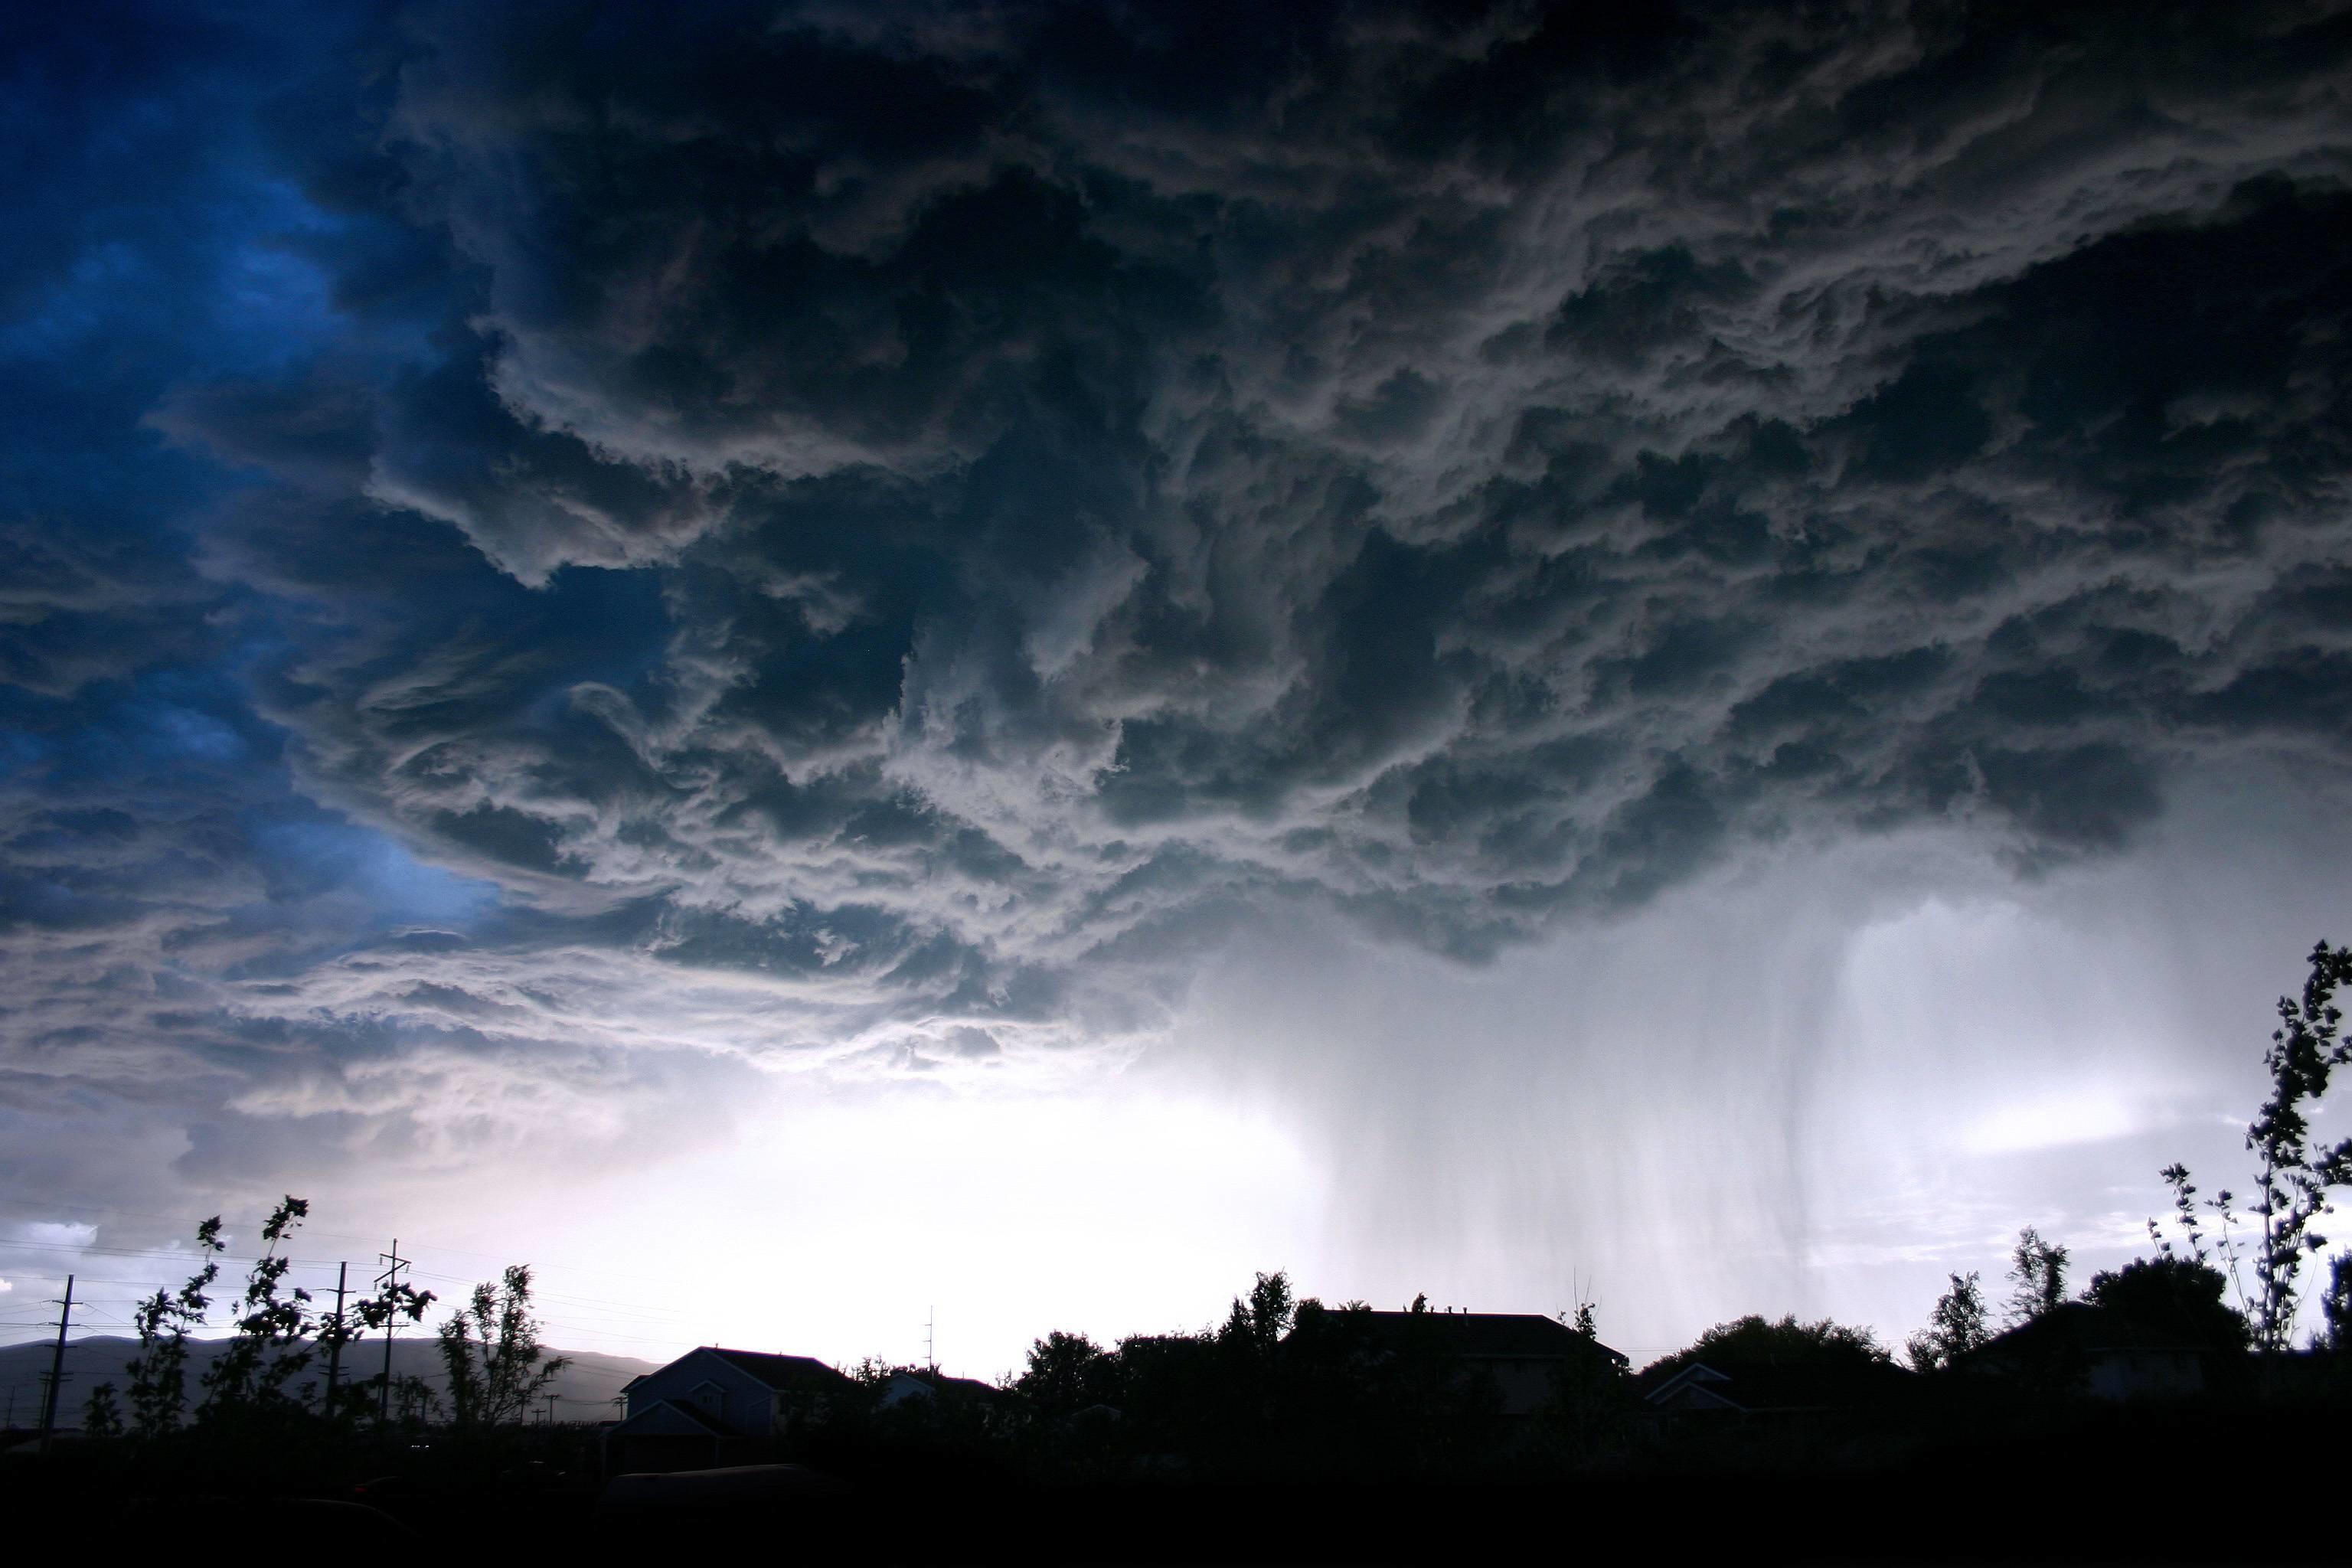 thunderstorm wallpaper 60 images